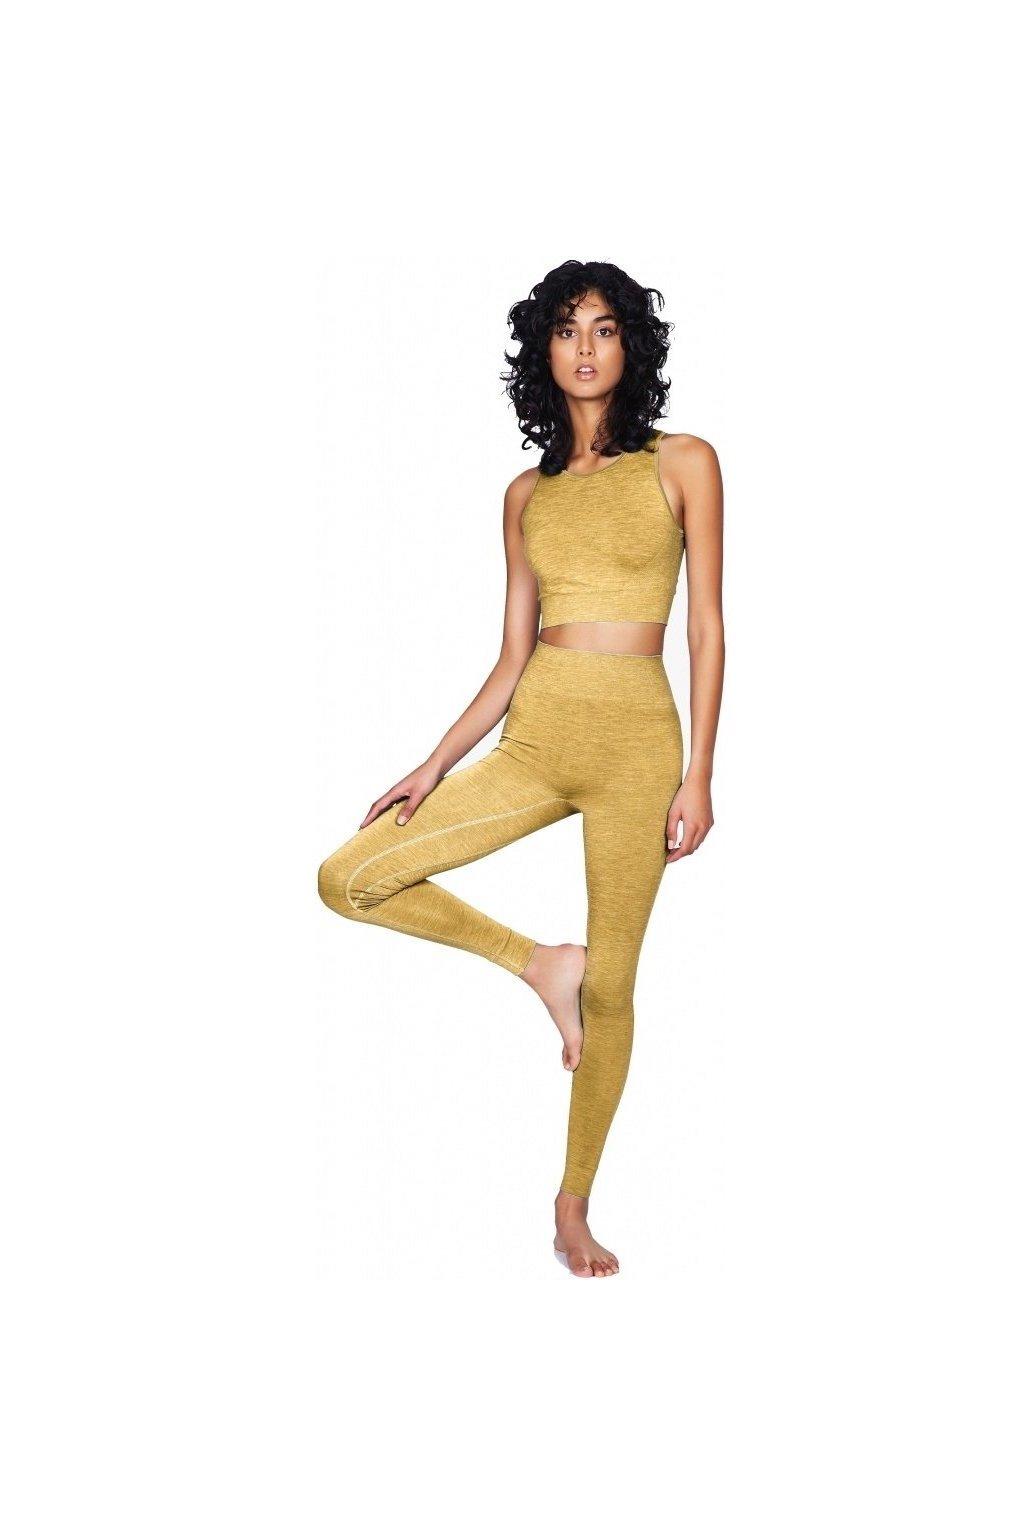 Seamless Leggings Seamless Leggings MY1003 Dandelion 11 1024x1024